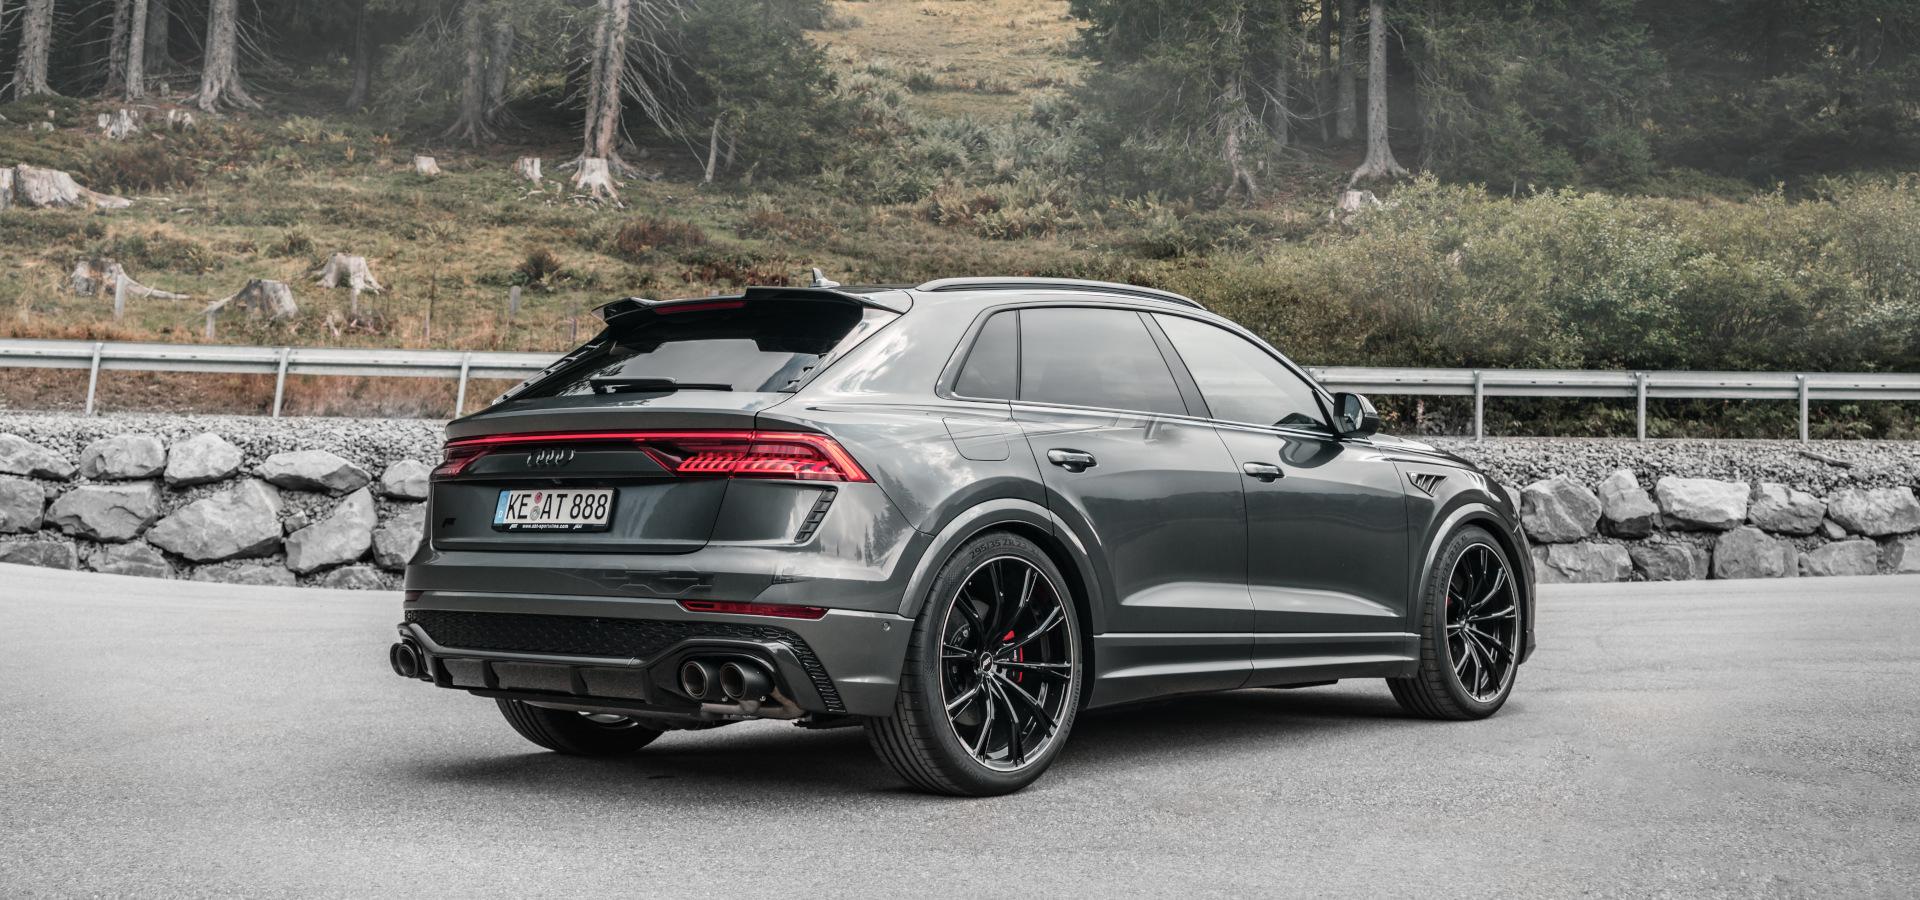 Audi Rsq8 Abt Sportsline